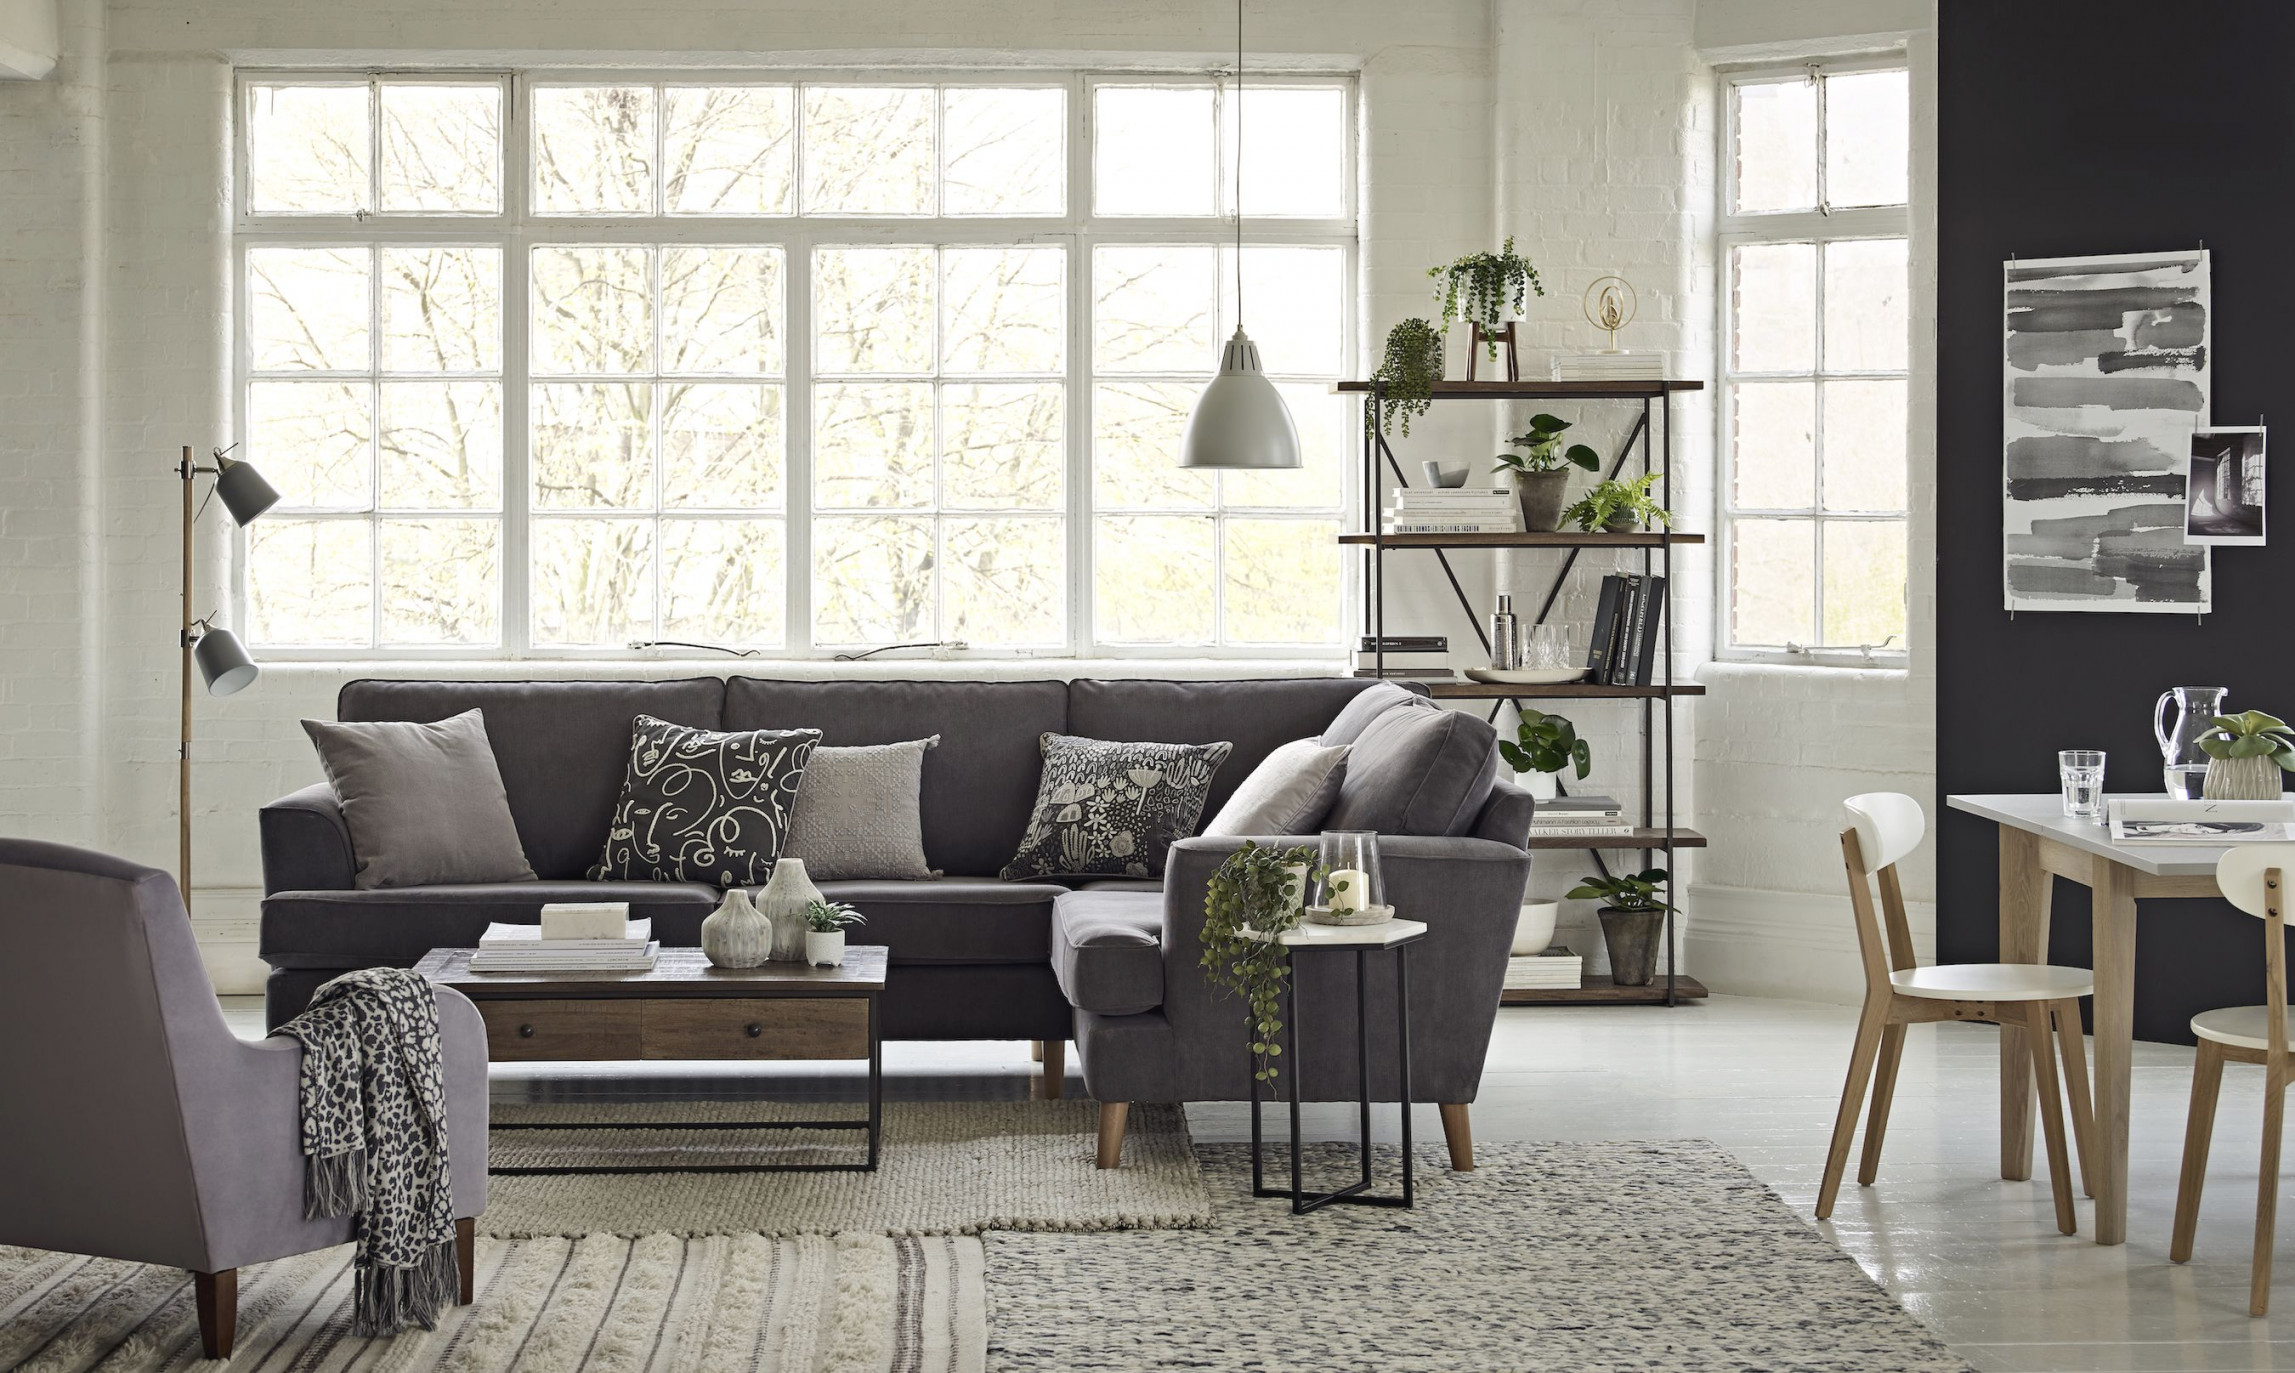 19 Grey Living Room Ideas – Grey Living Room regarding Beautiful Gallery Gray And Teal Living Room